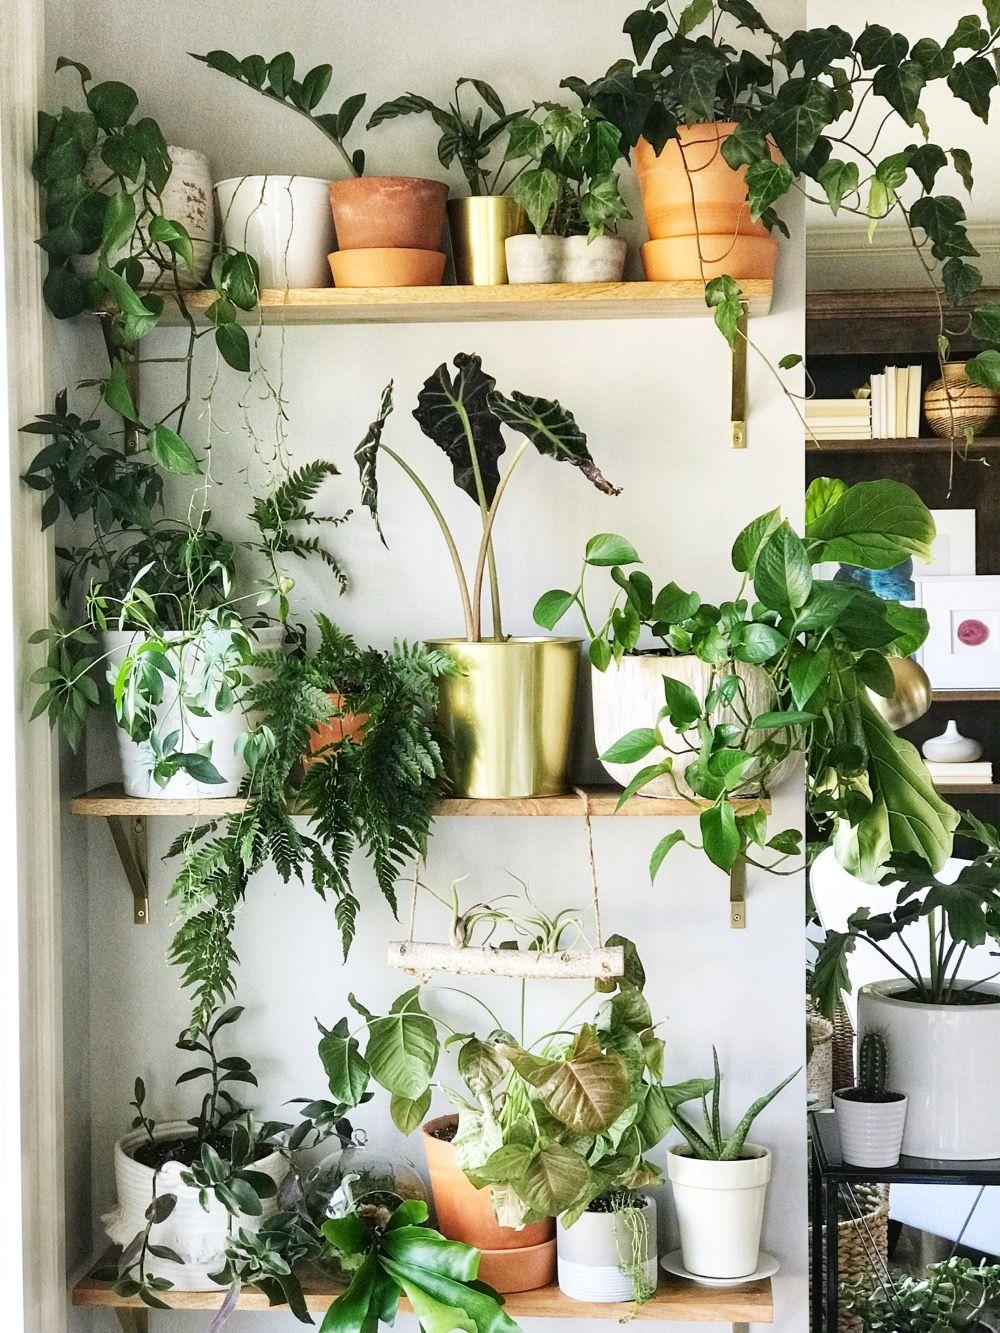 Indoor Plant Wall in 2020 Indoor plant wall, Indoor